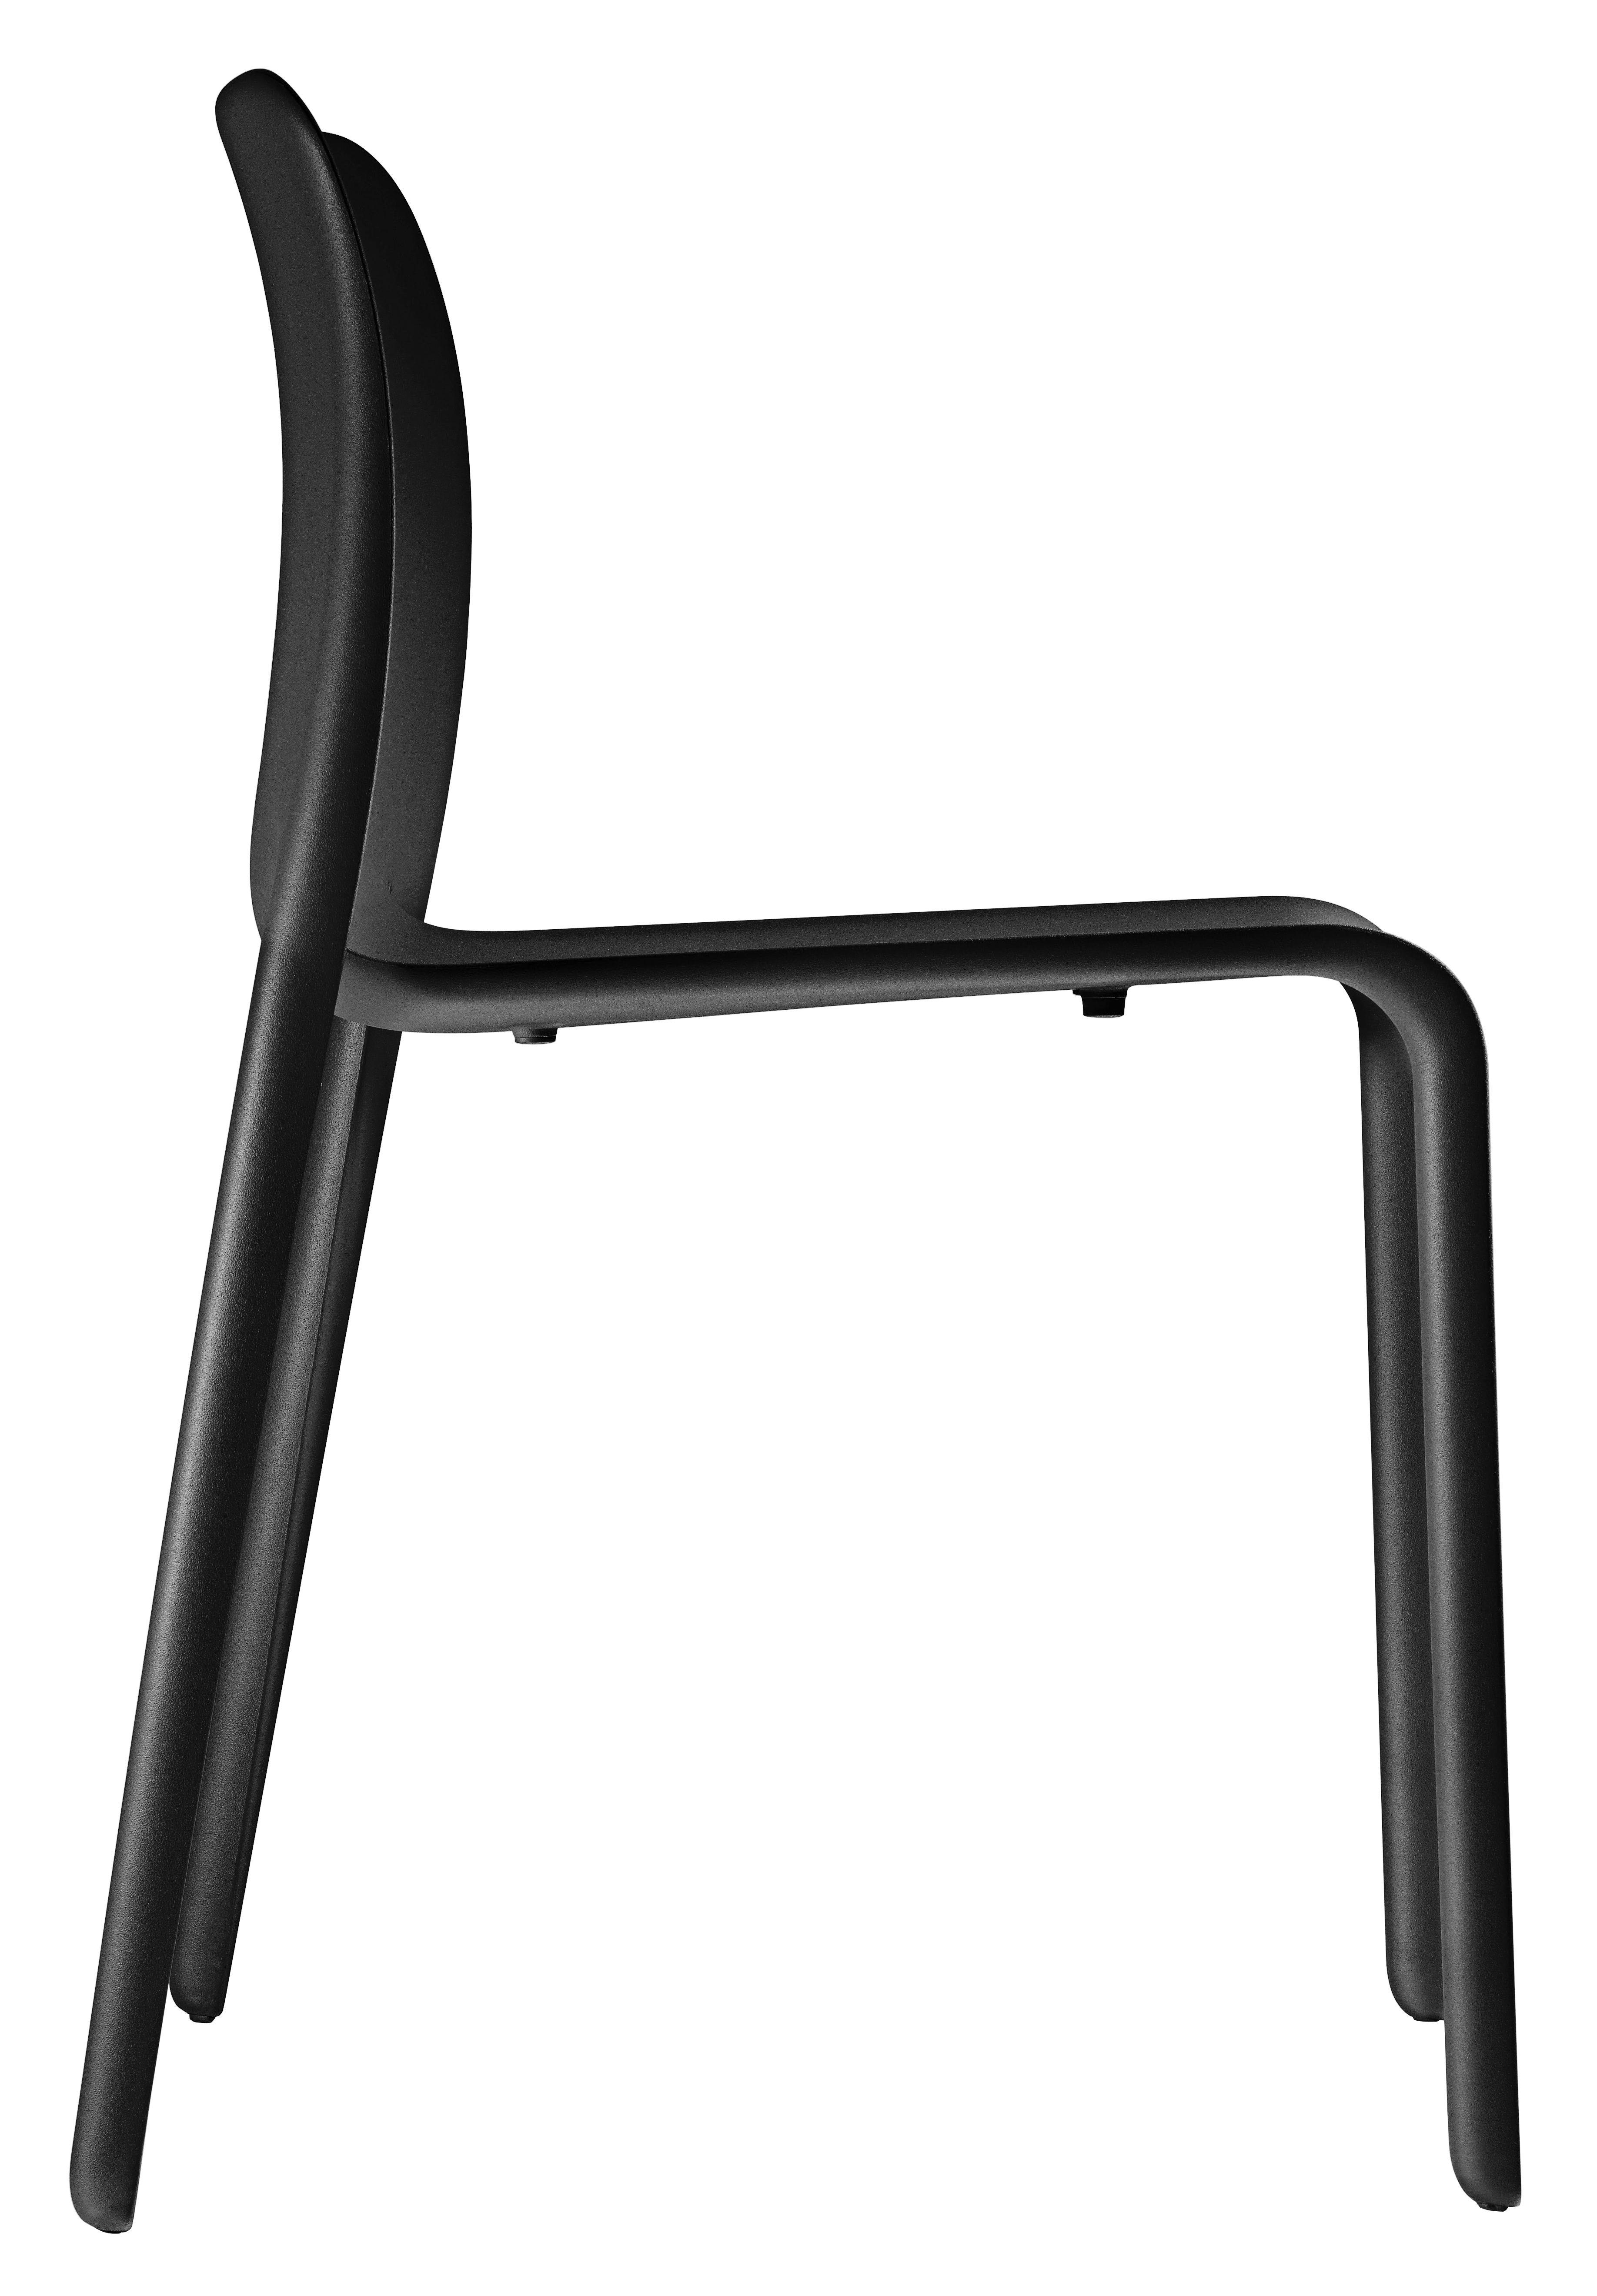 chaise empilable first chair plastique noir magis. Black Bedroom Furniture Sets. Home Design Ideas